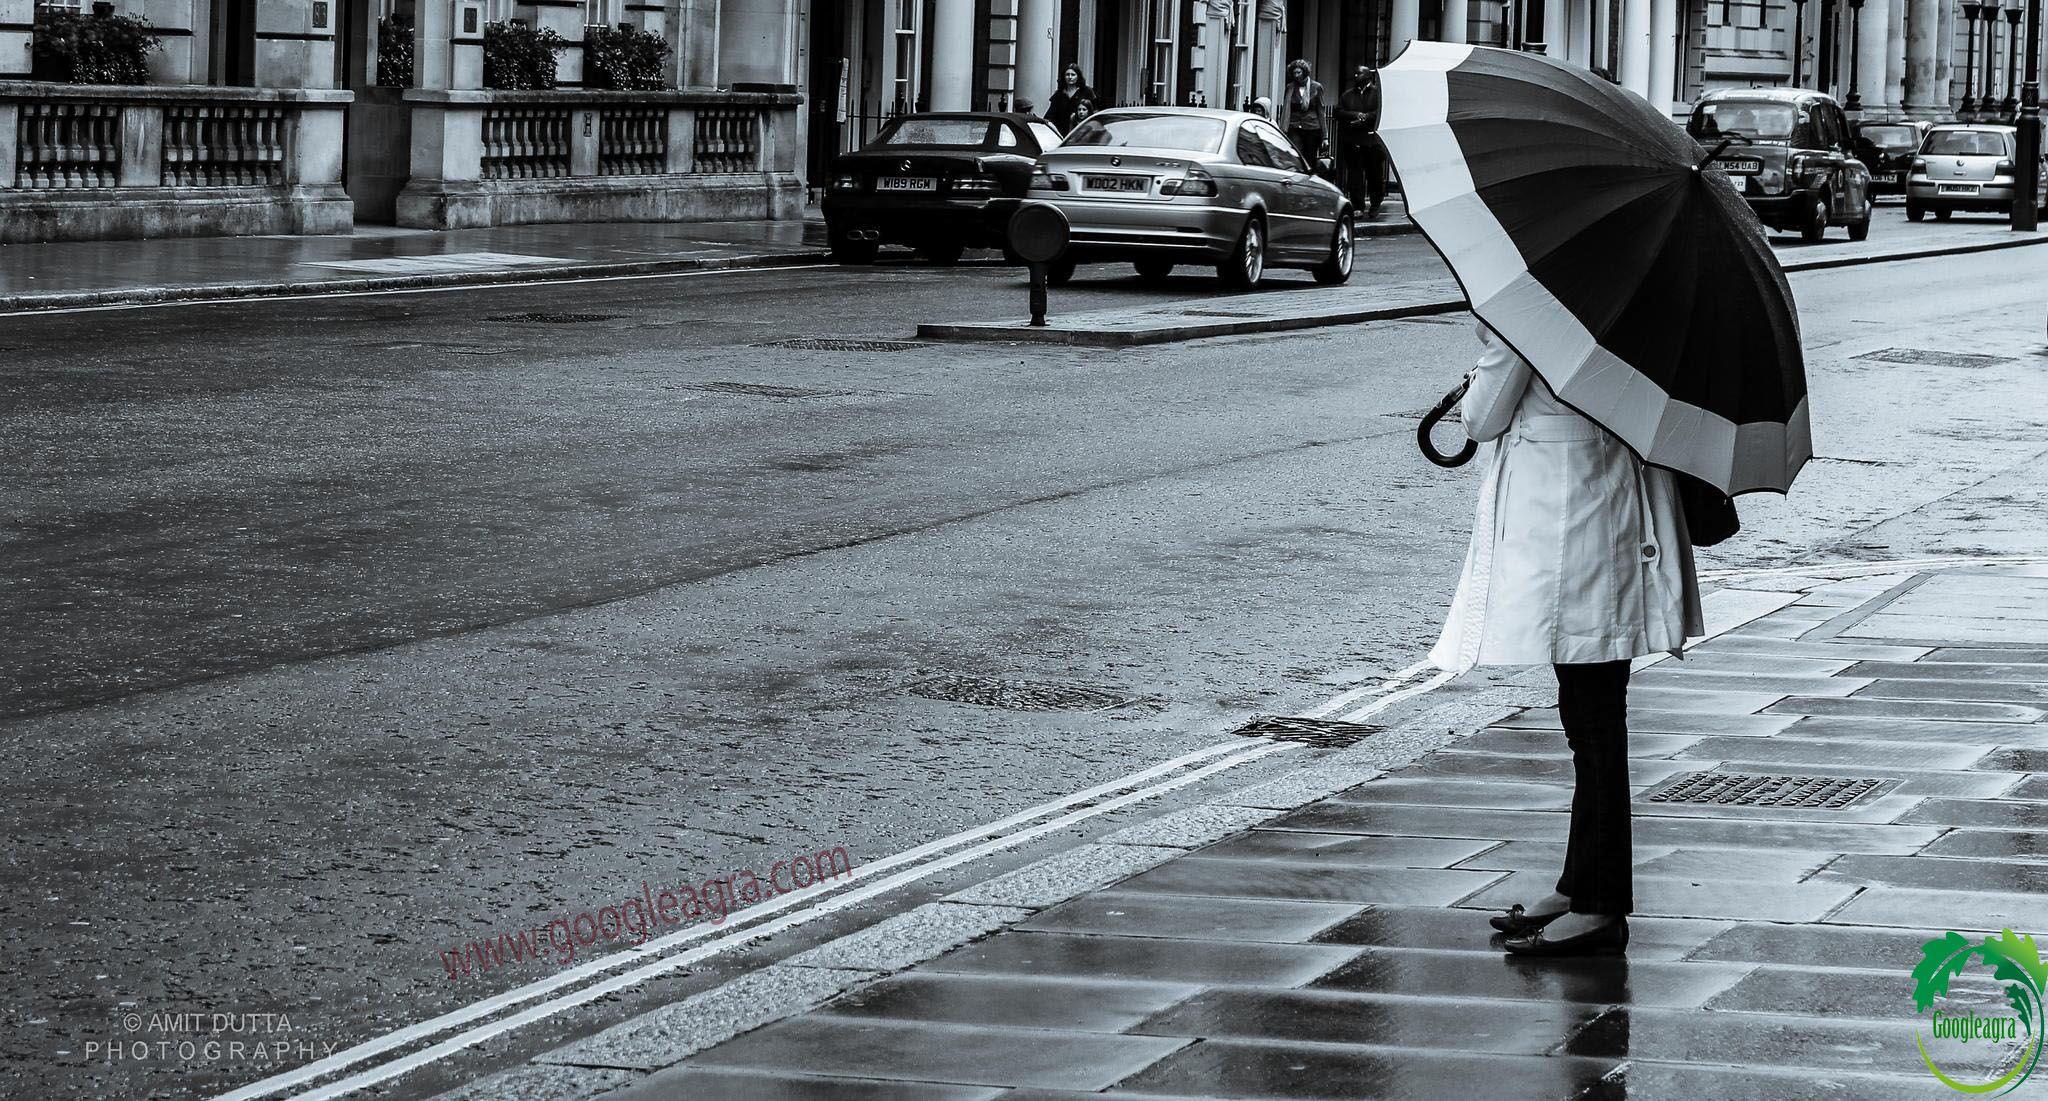 Girl Waiting for someone hd wallpaper wwwgoogleagracom Love hd 2048x1101